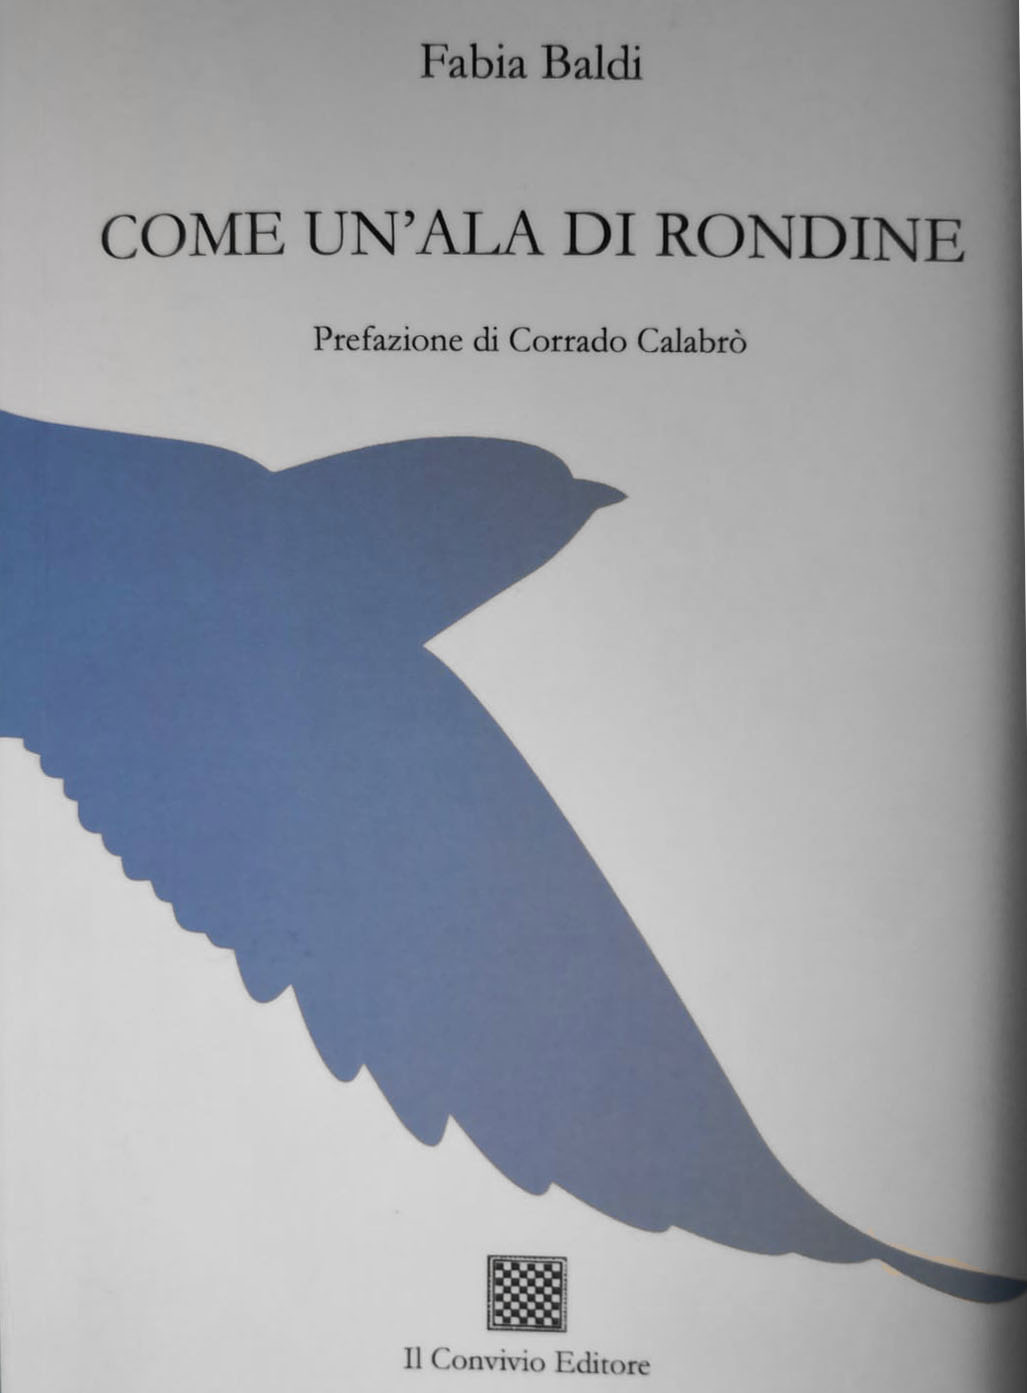 COME UN'ALA DI RONDINE: i versi di FABIA BALDI